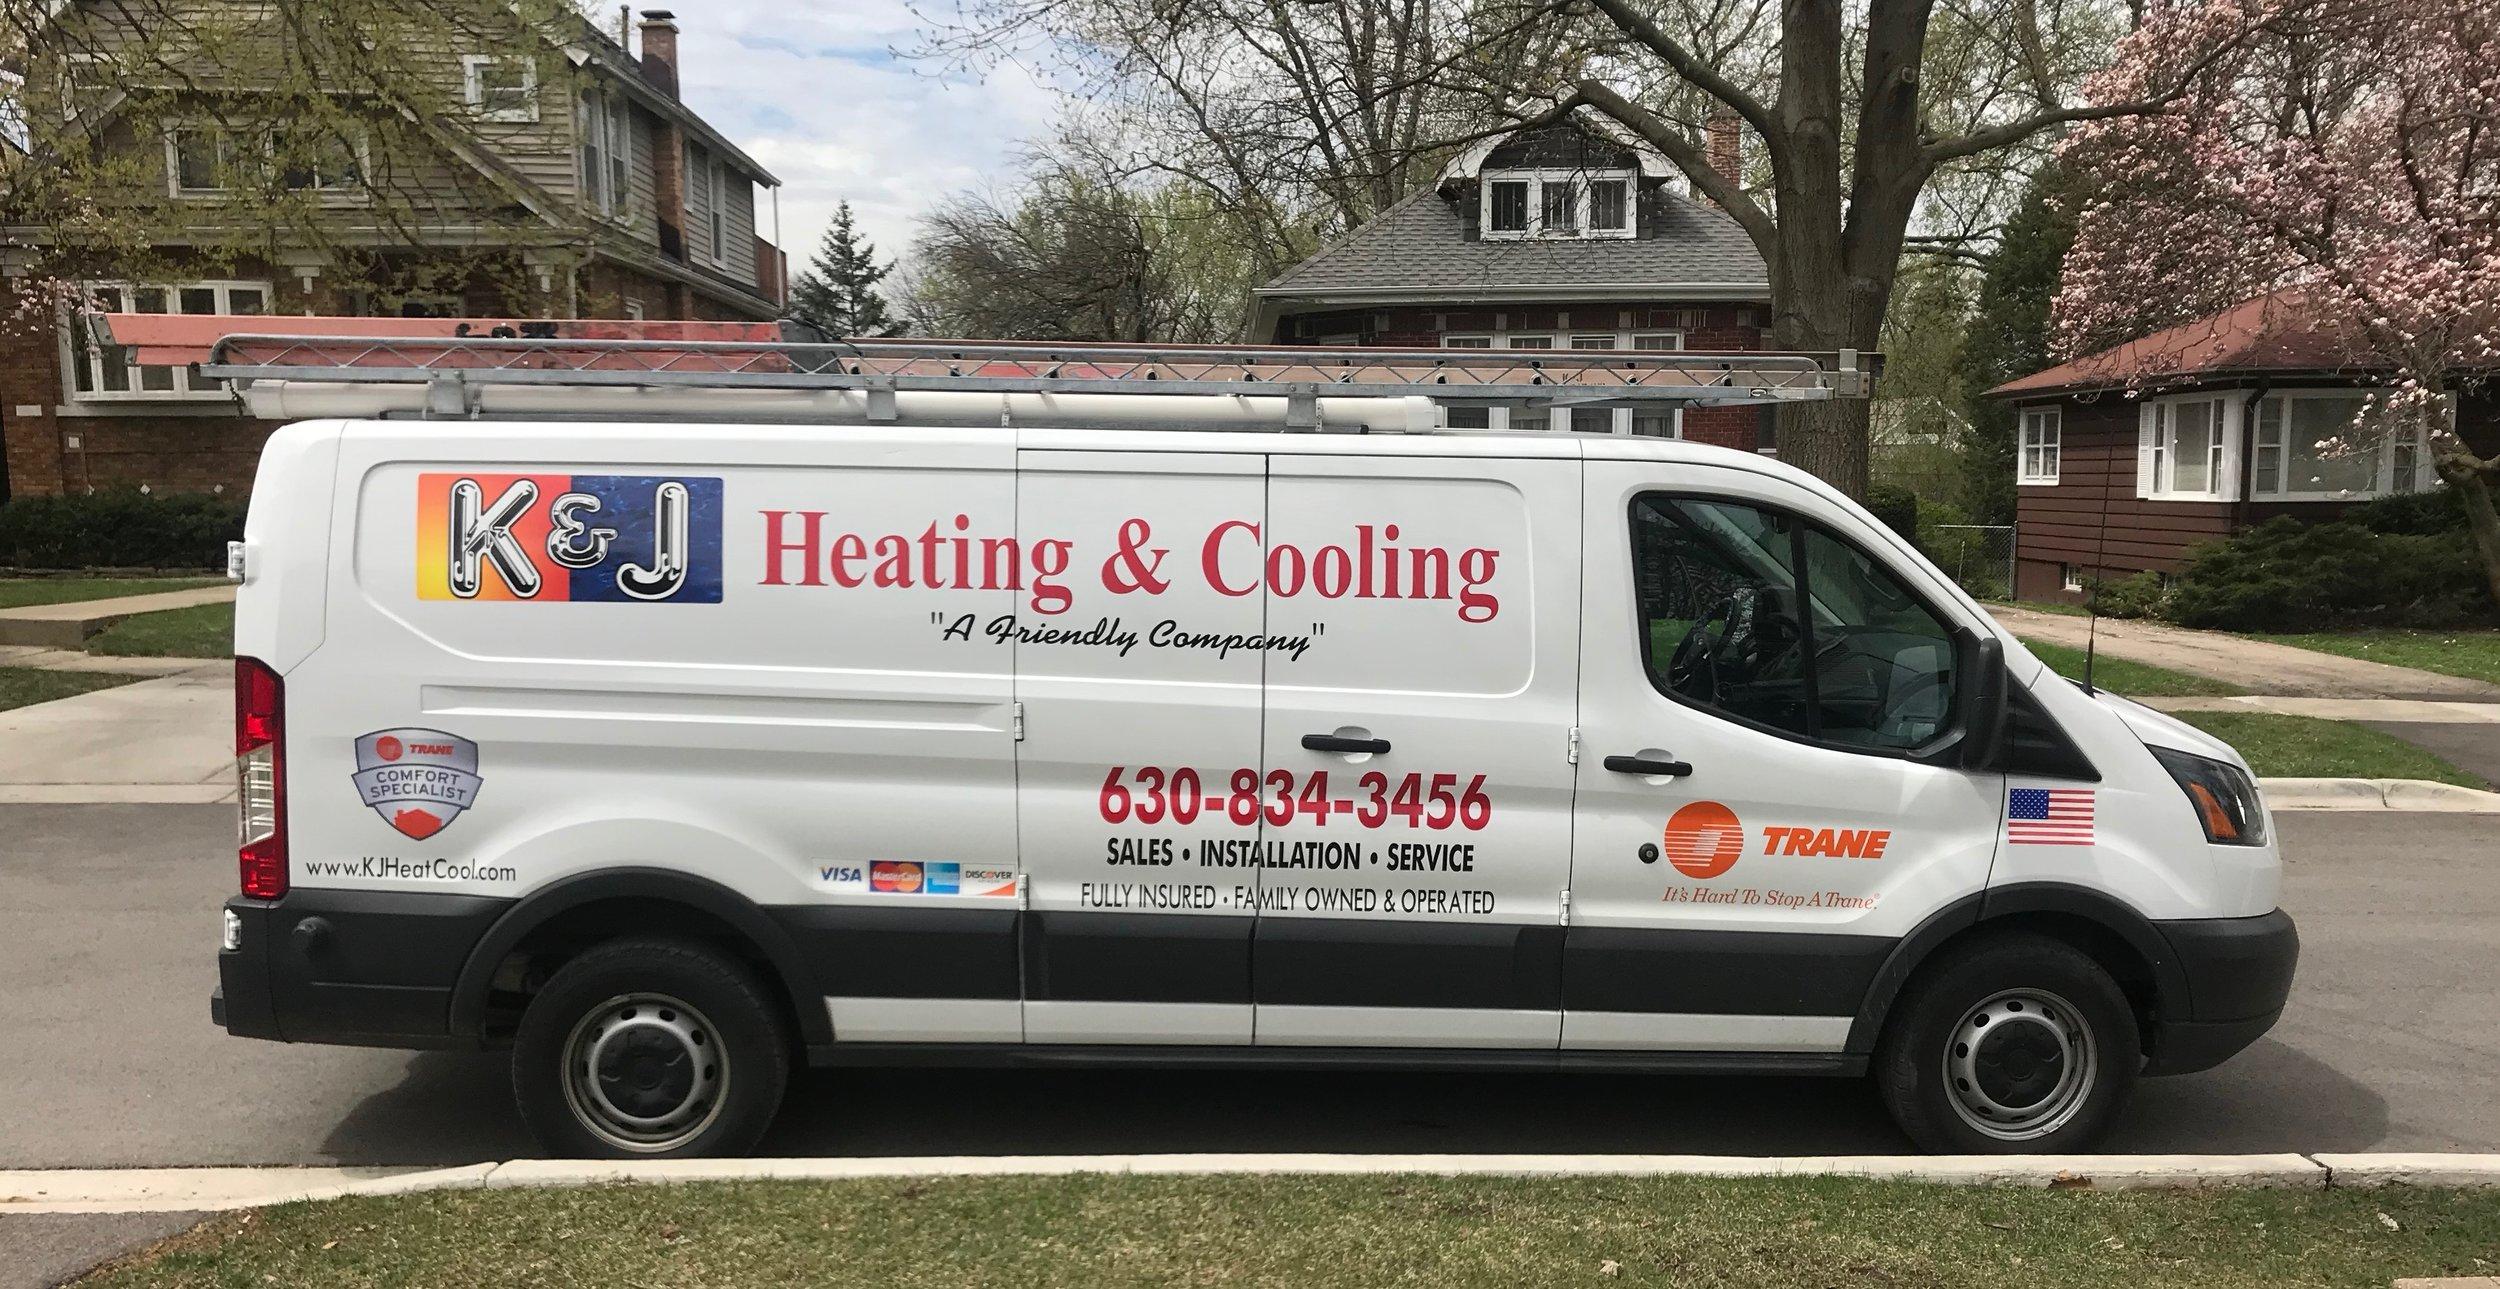 K & J Heating and Cooling Best HVAC Company Near Me